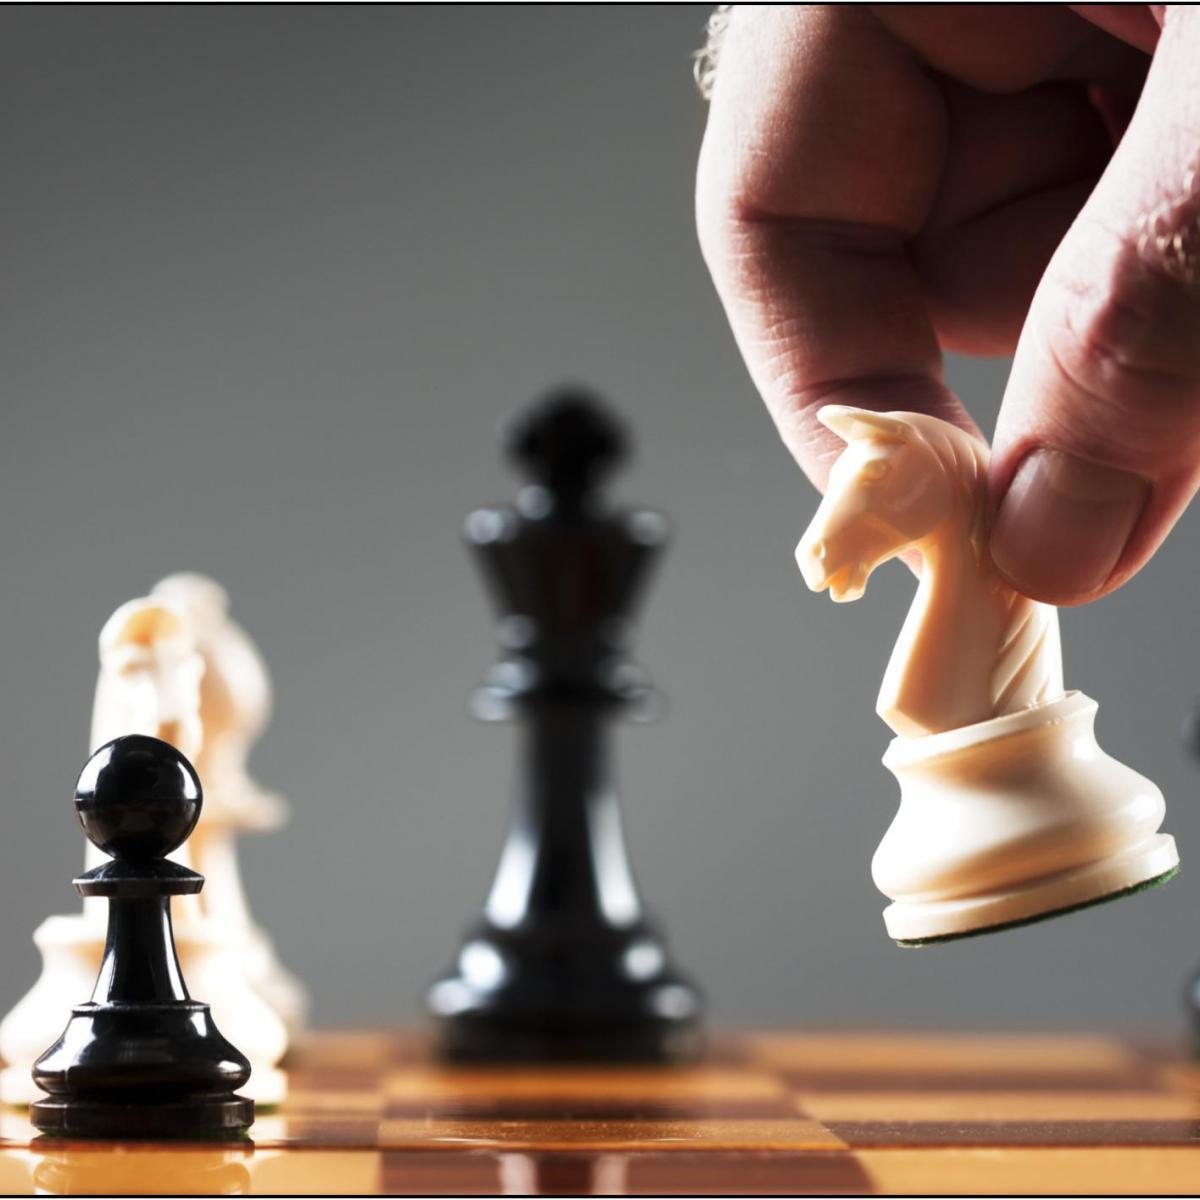 Гиф доброго, открытки шахматиста